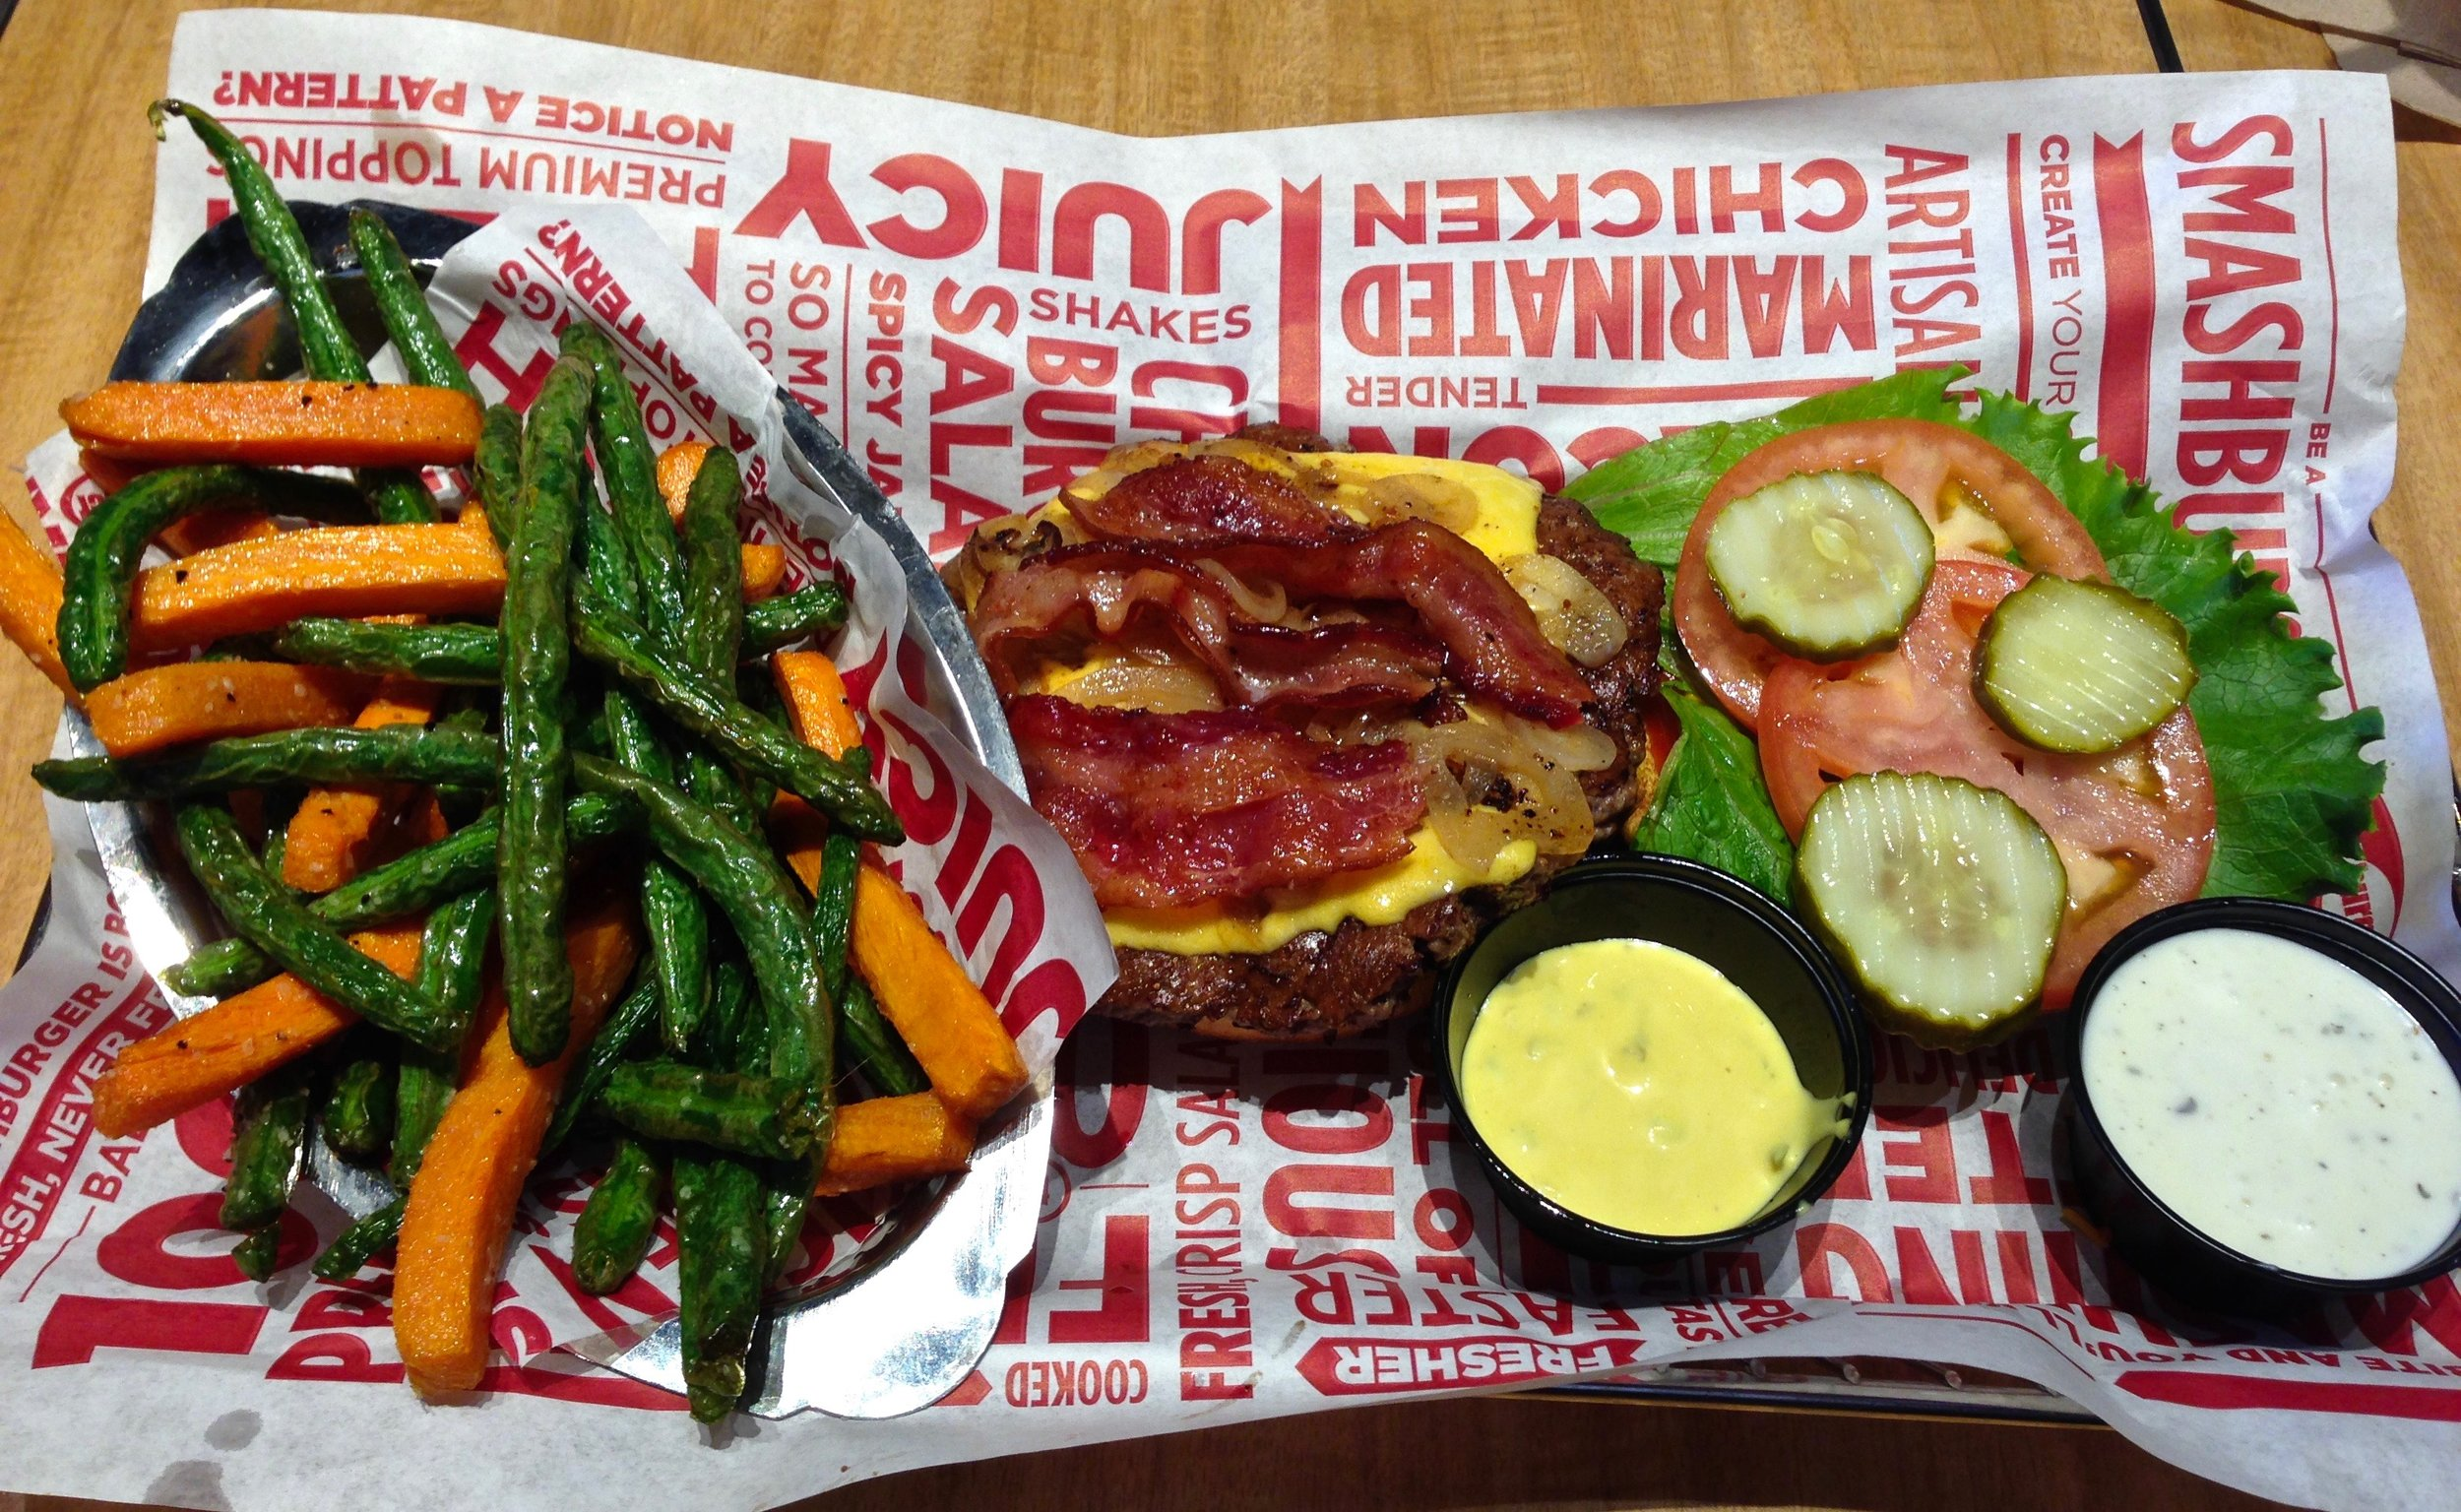 bacon cheeseburger and flash fried veggies